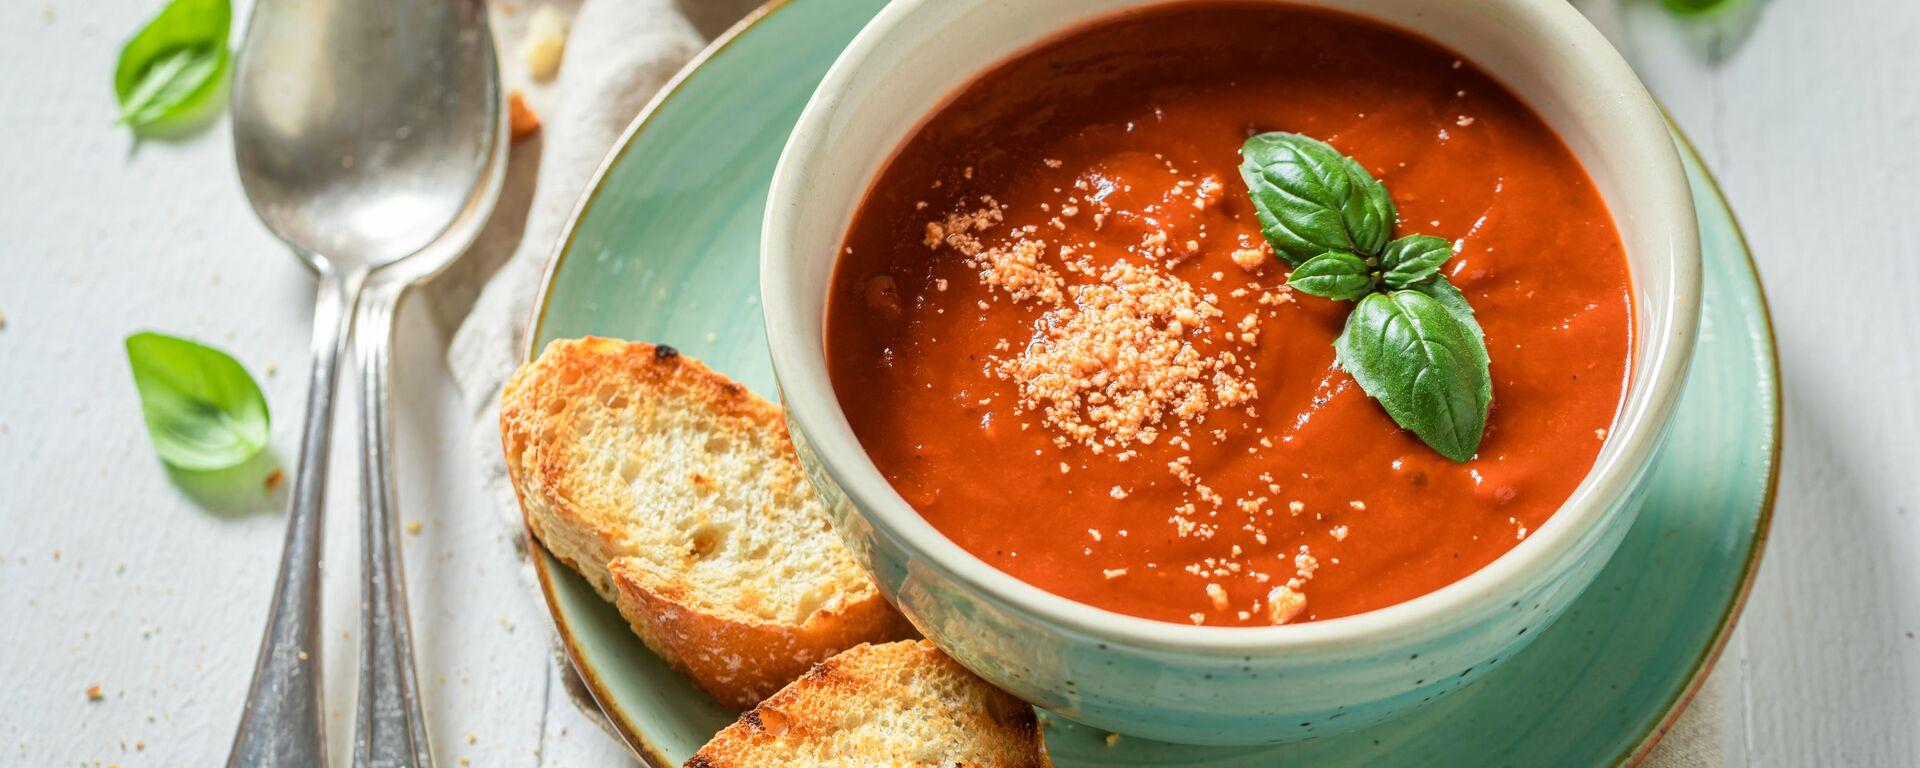 Zupa pomidorowa - Sputnik Polska, 1920, 13.09.2021